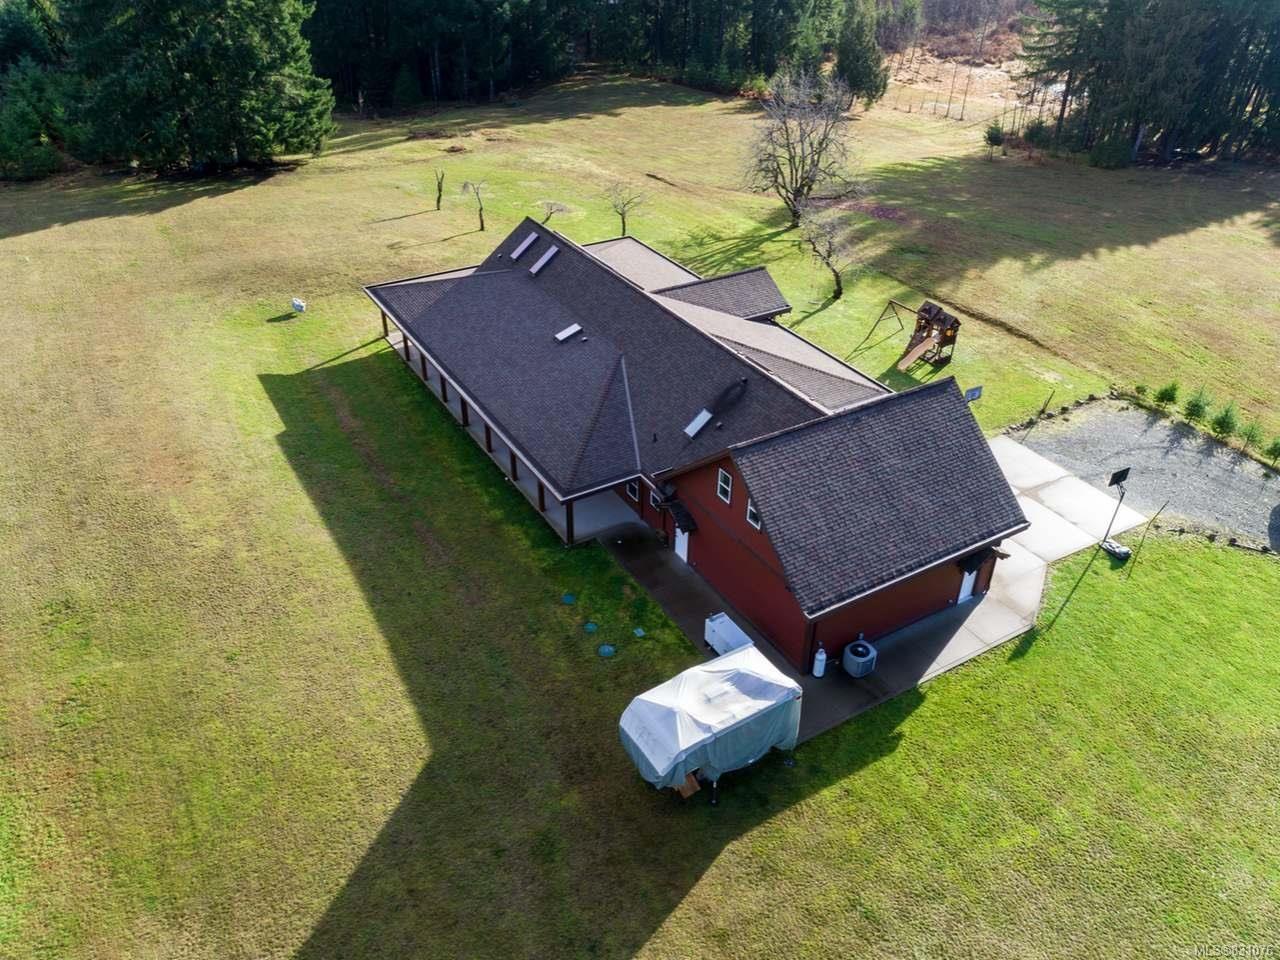 Photo 30: Photos: 6159 Strathcona St in PORT ALBERNI: PA Alberni Valley House for sale (Port Alberni)  : MLS®# 831076